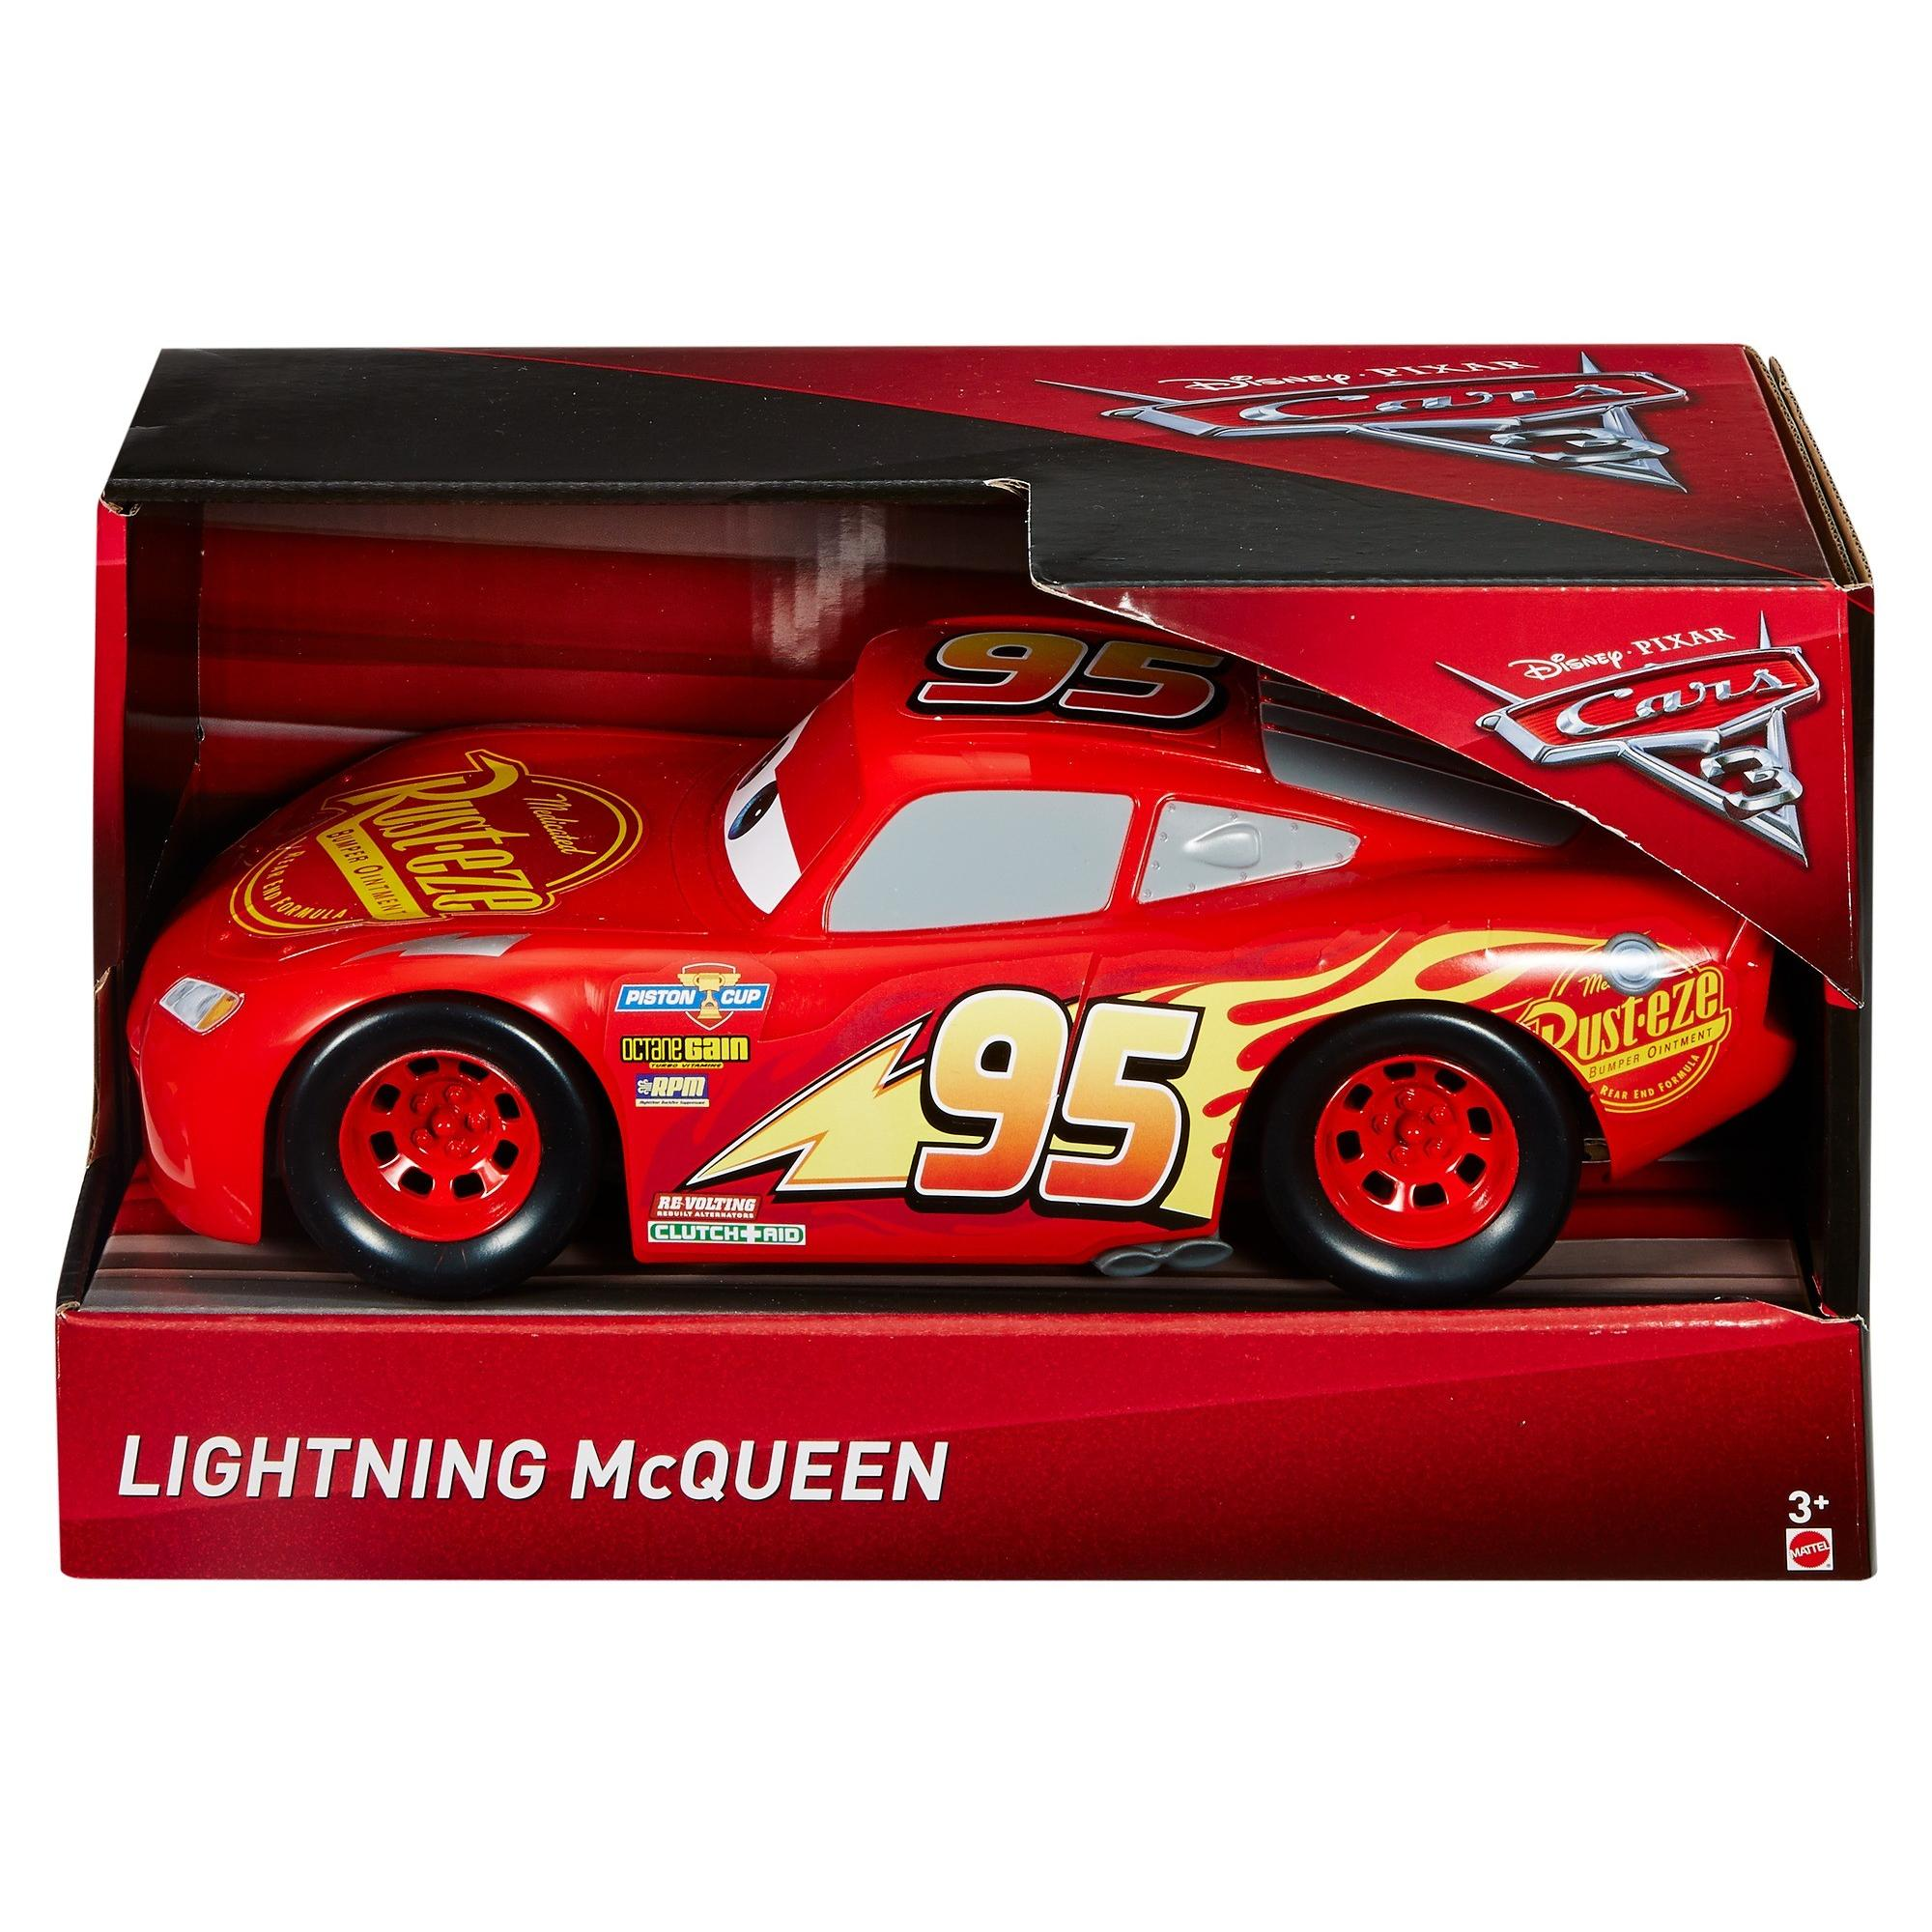 Disney Pixar Cars 3 Lightning Mcqueen 10 5 Scale Vehicle